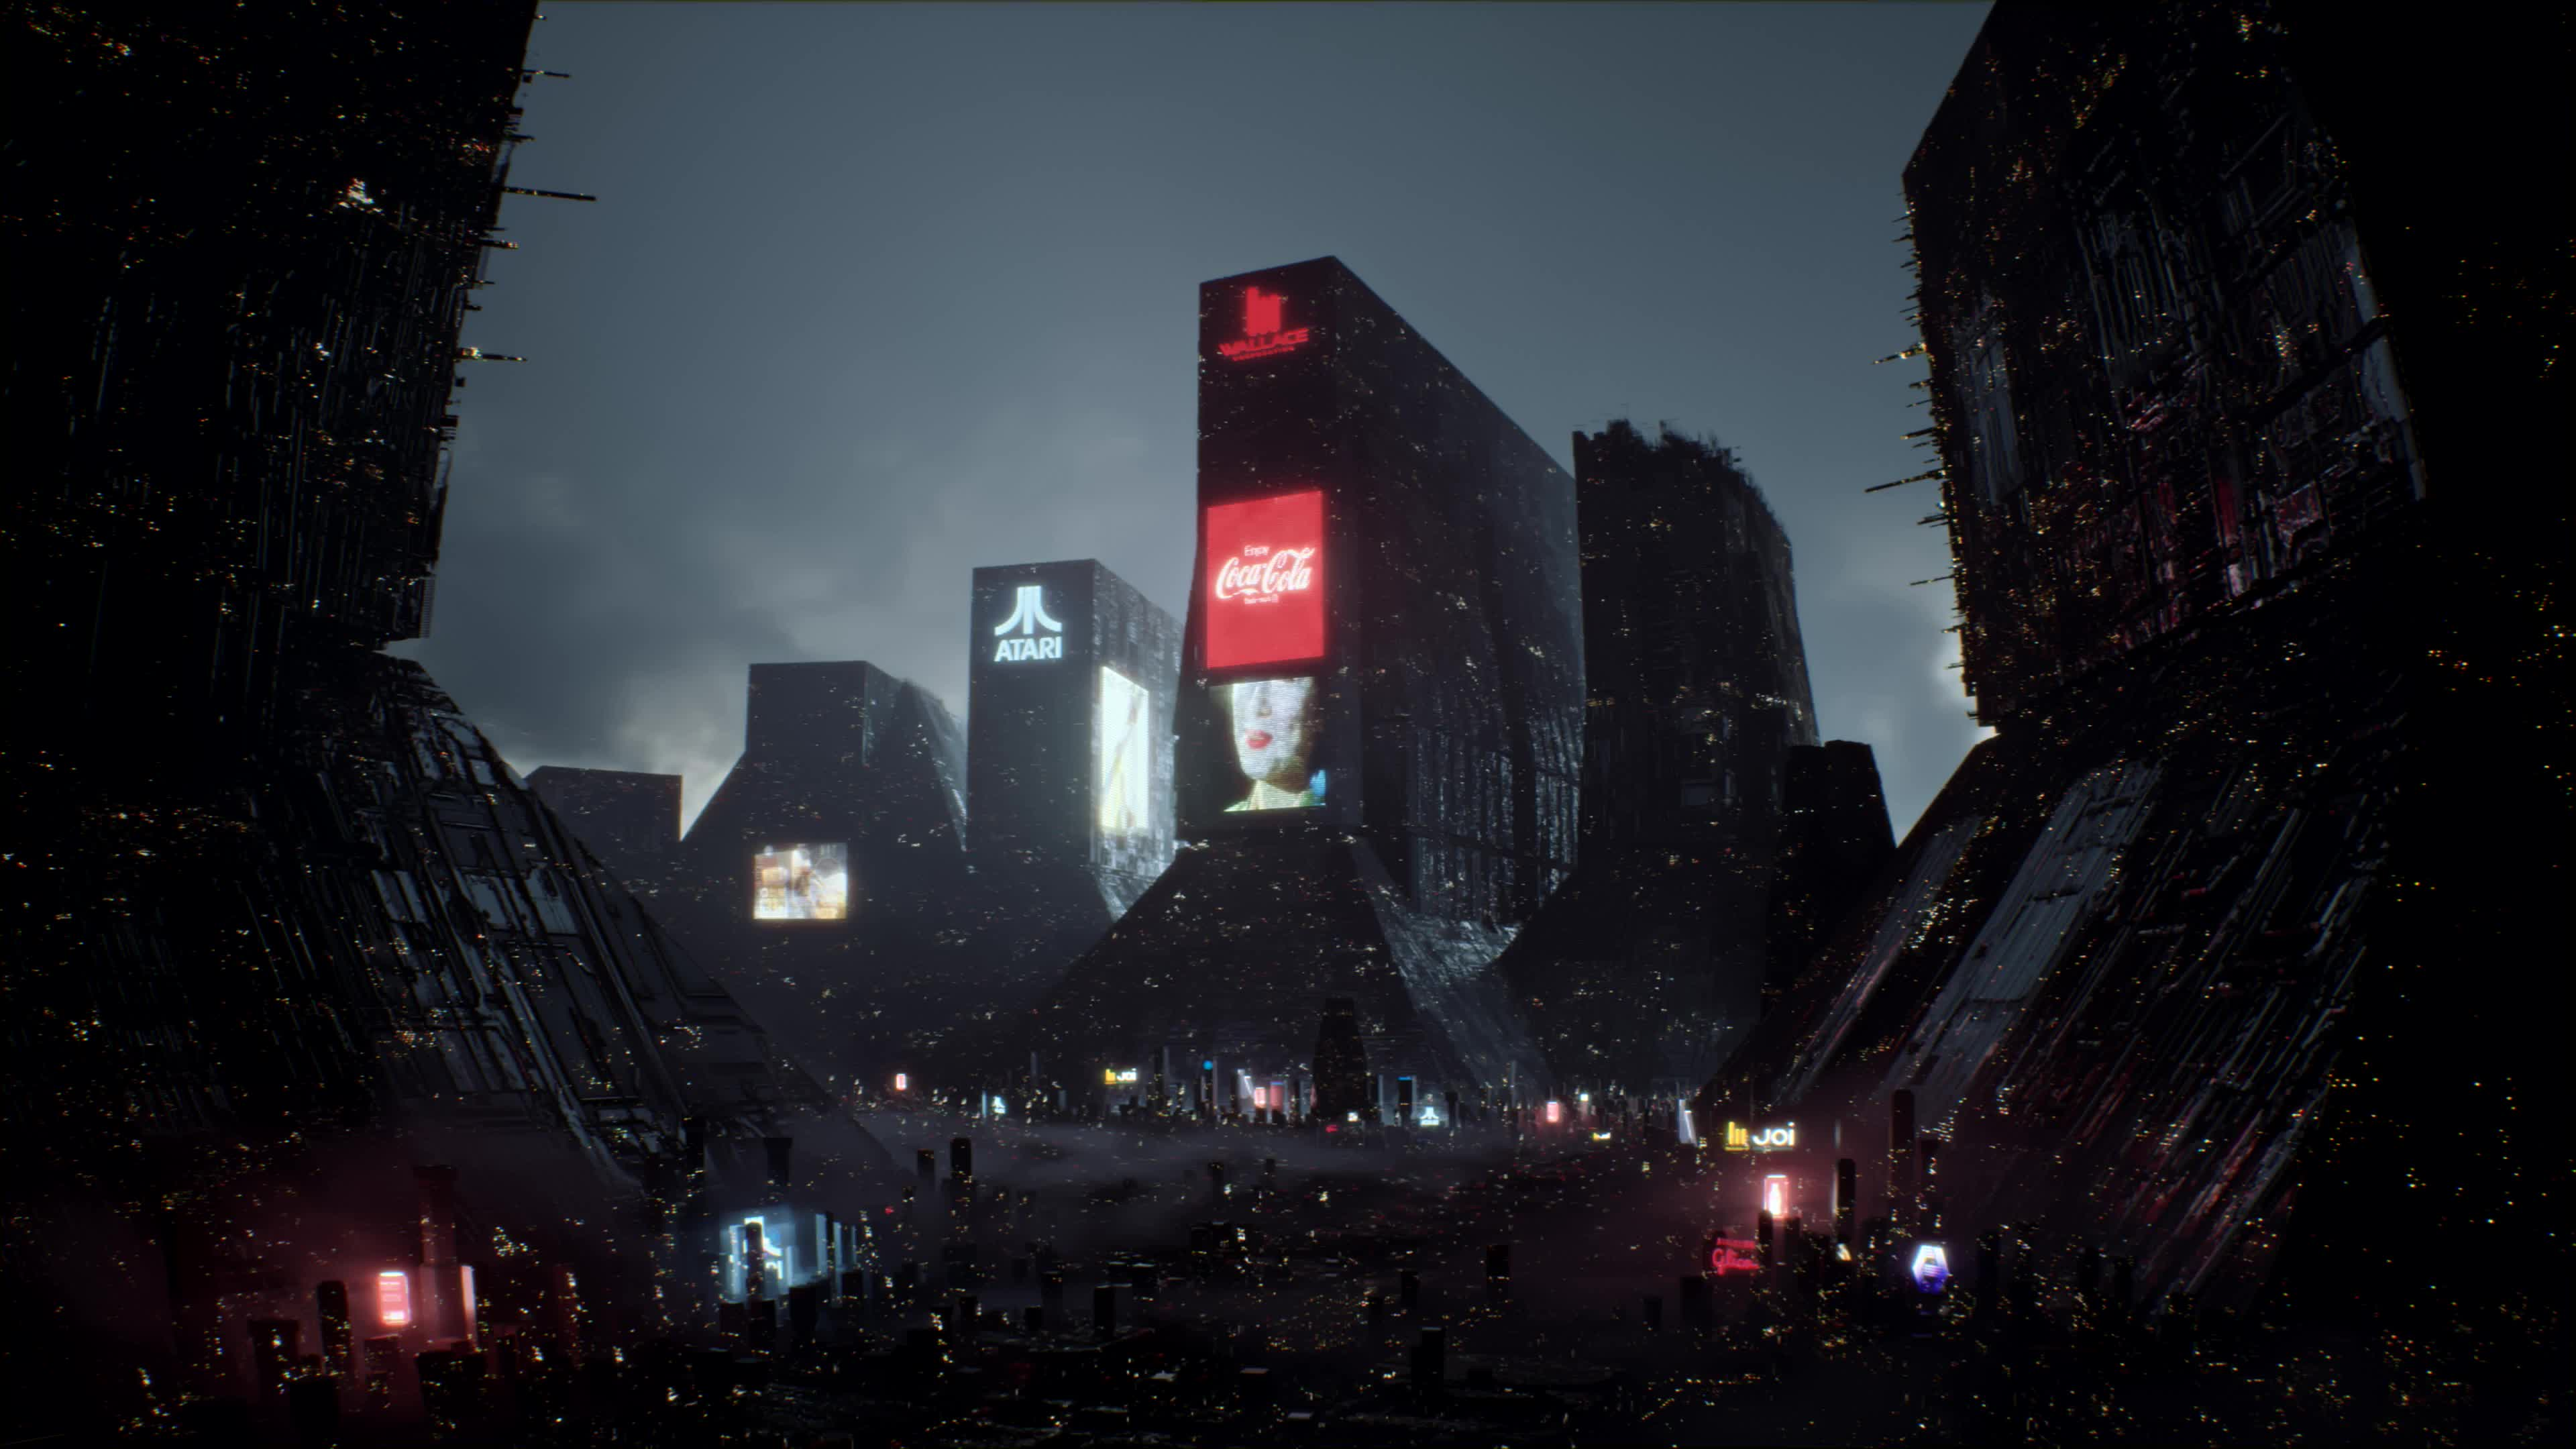 Blade Runner City Lights 4k Live Wallpaper Gif Gfycat